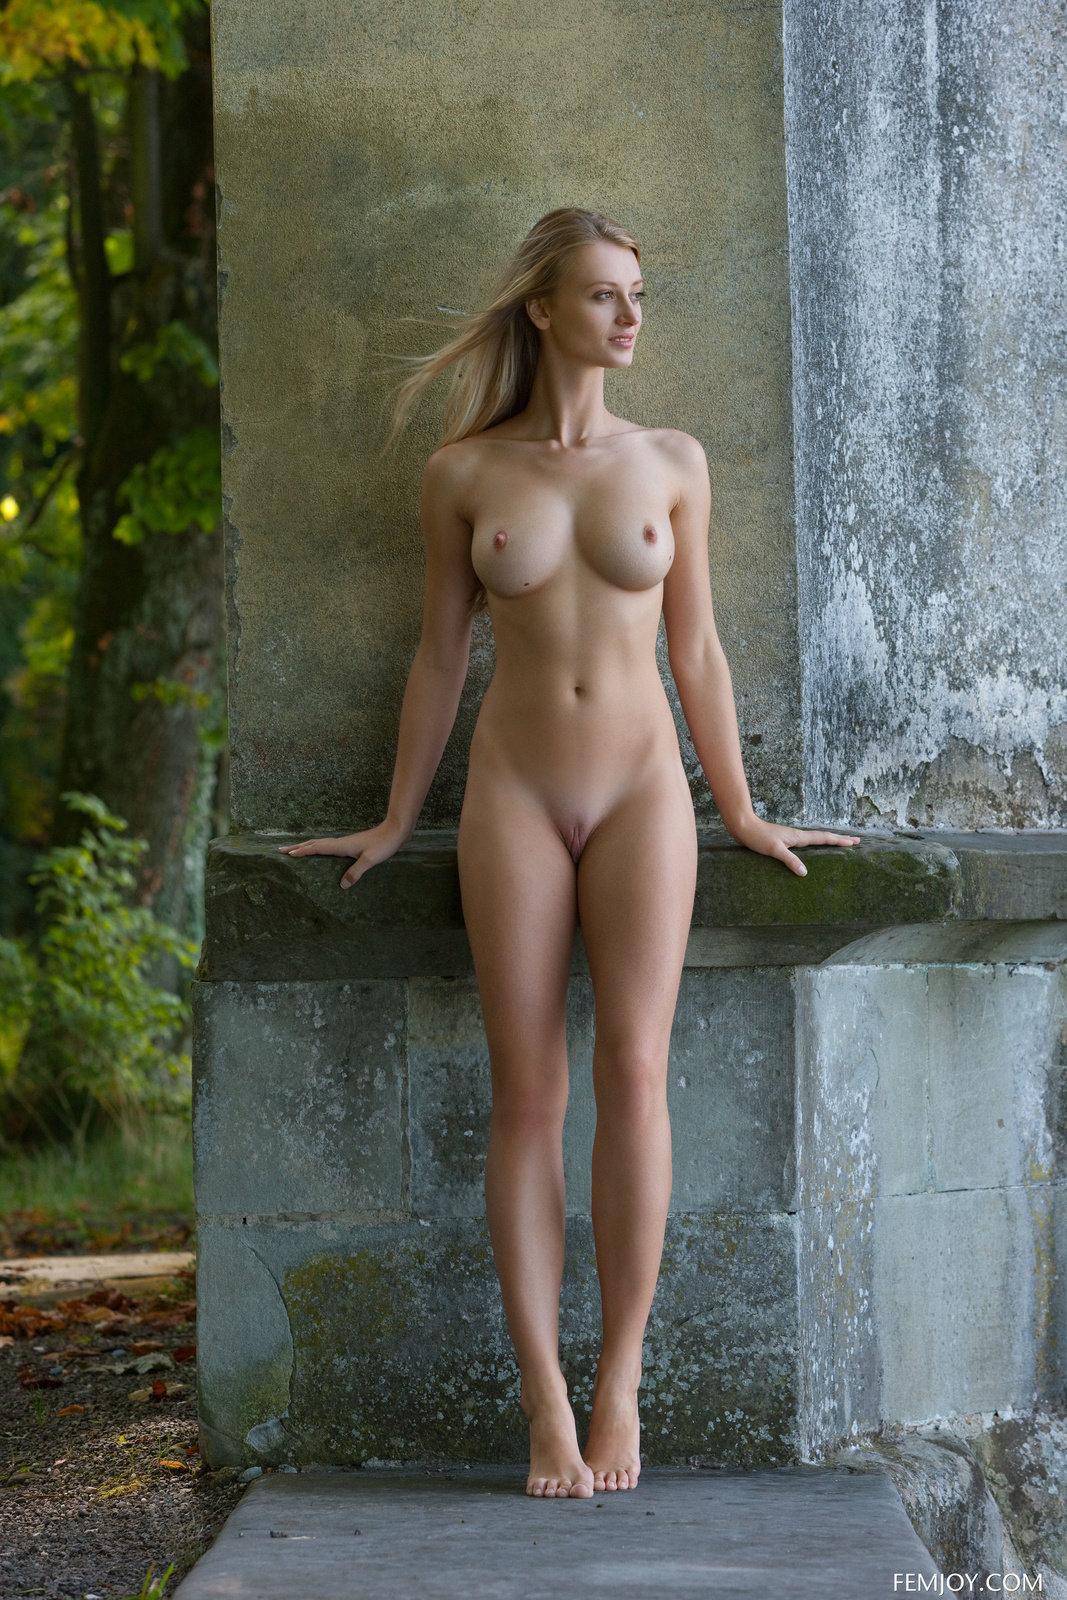 Carisha In Magic Castle By Femjoy 16 Photos  Erotic -5012